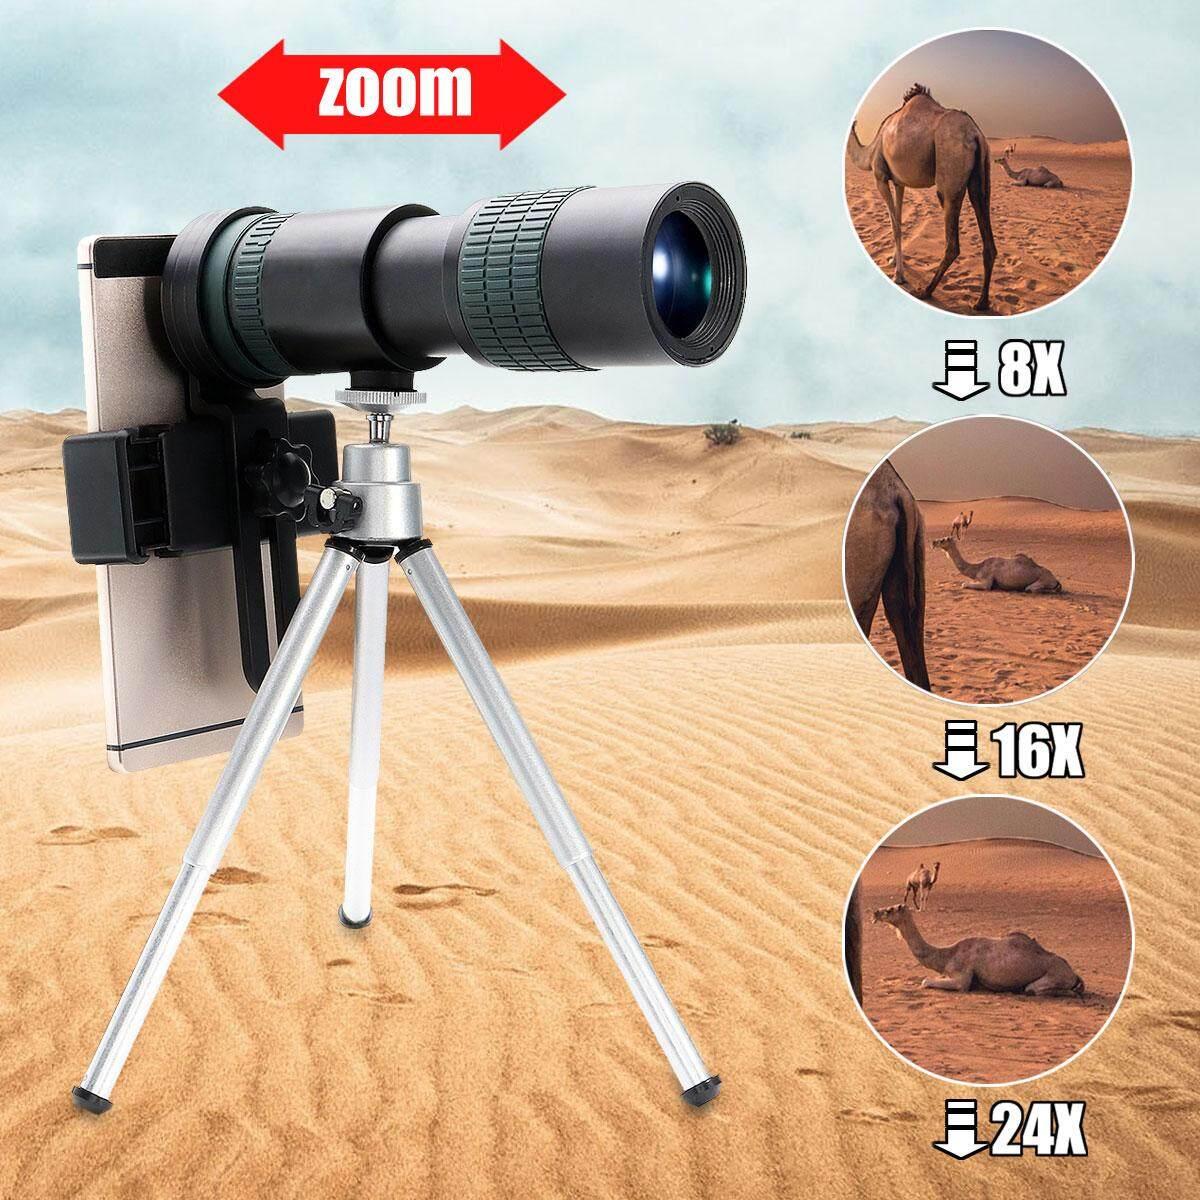 8X-24X Zoom Teleskop Telefoto Monokuler Optik Lensa Kamera + Telepon Clip + Tripod-